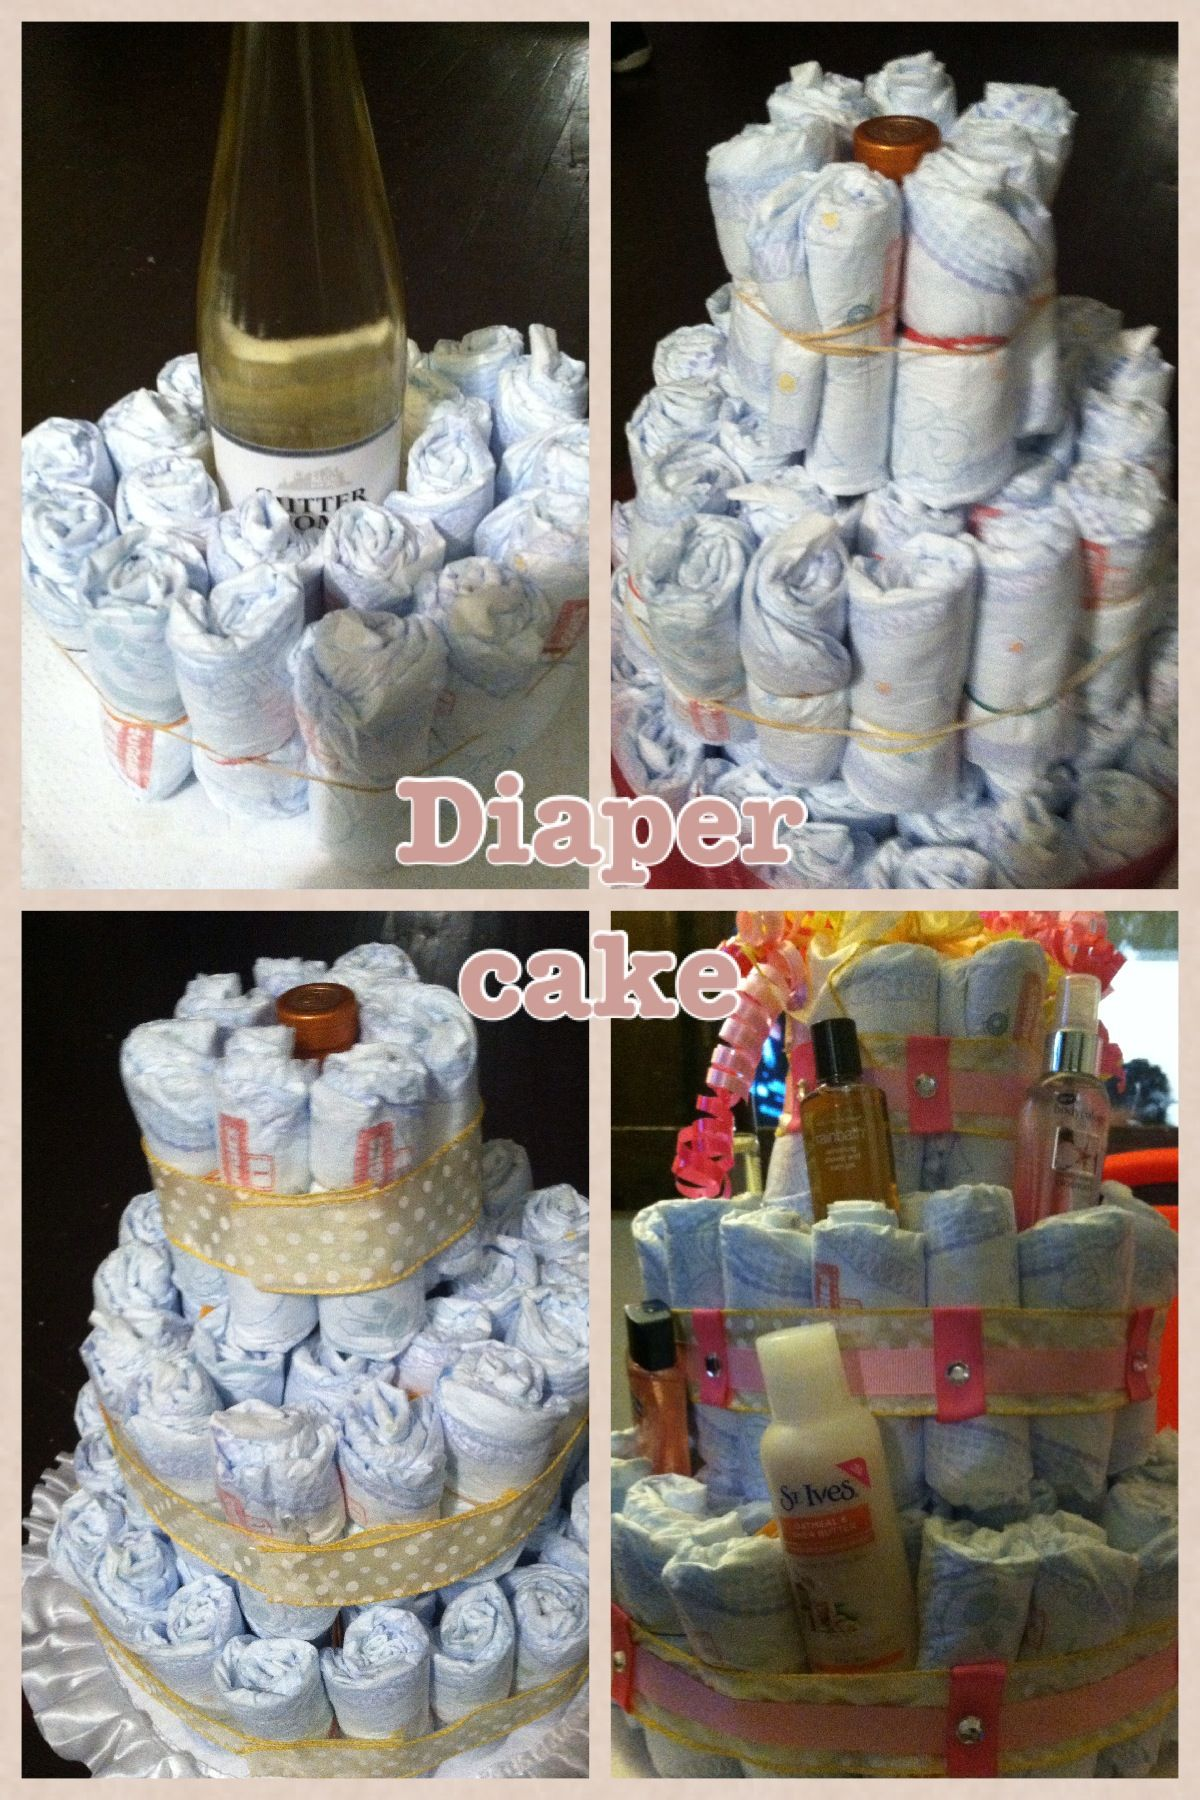 Diaper Cake For Baby Shower Ruffled Cake Plate 5 99 At